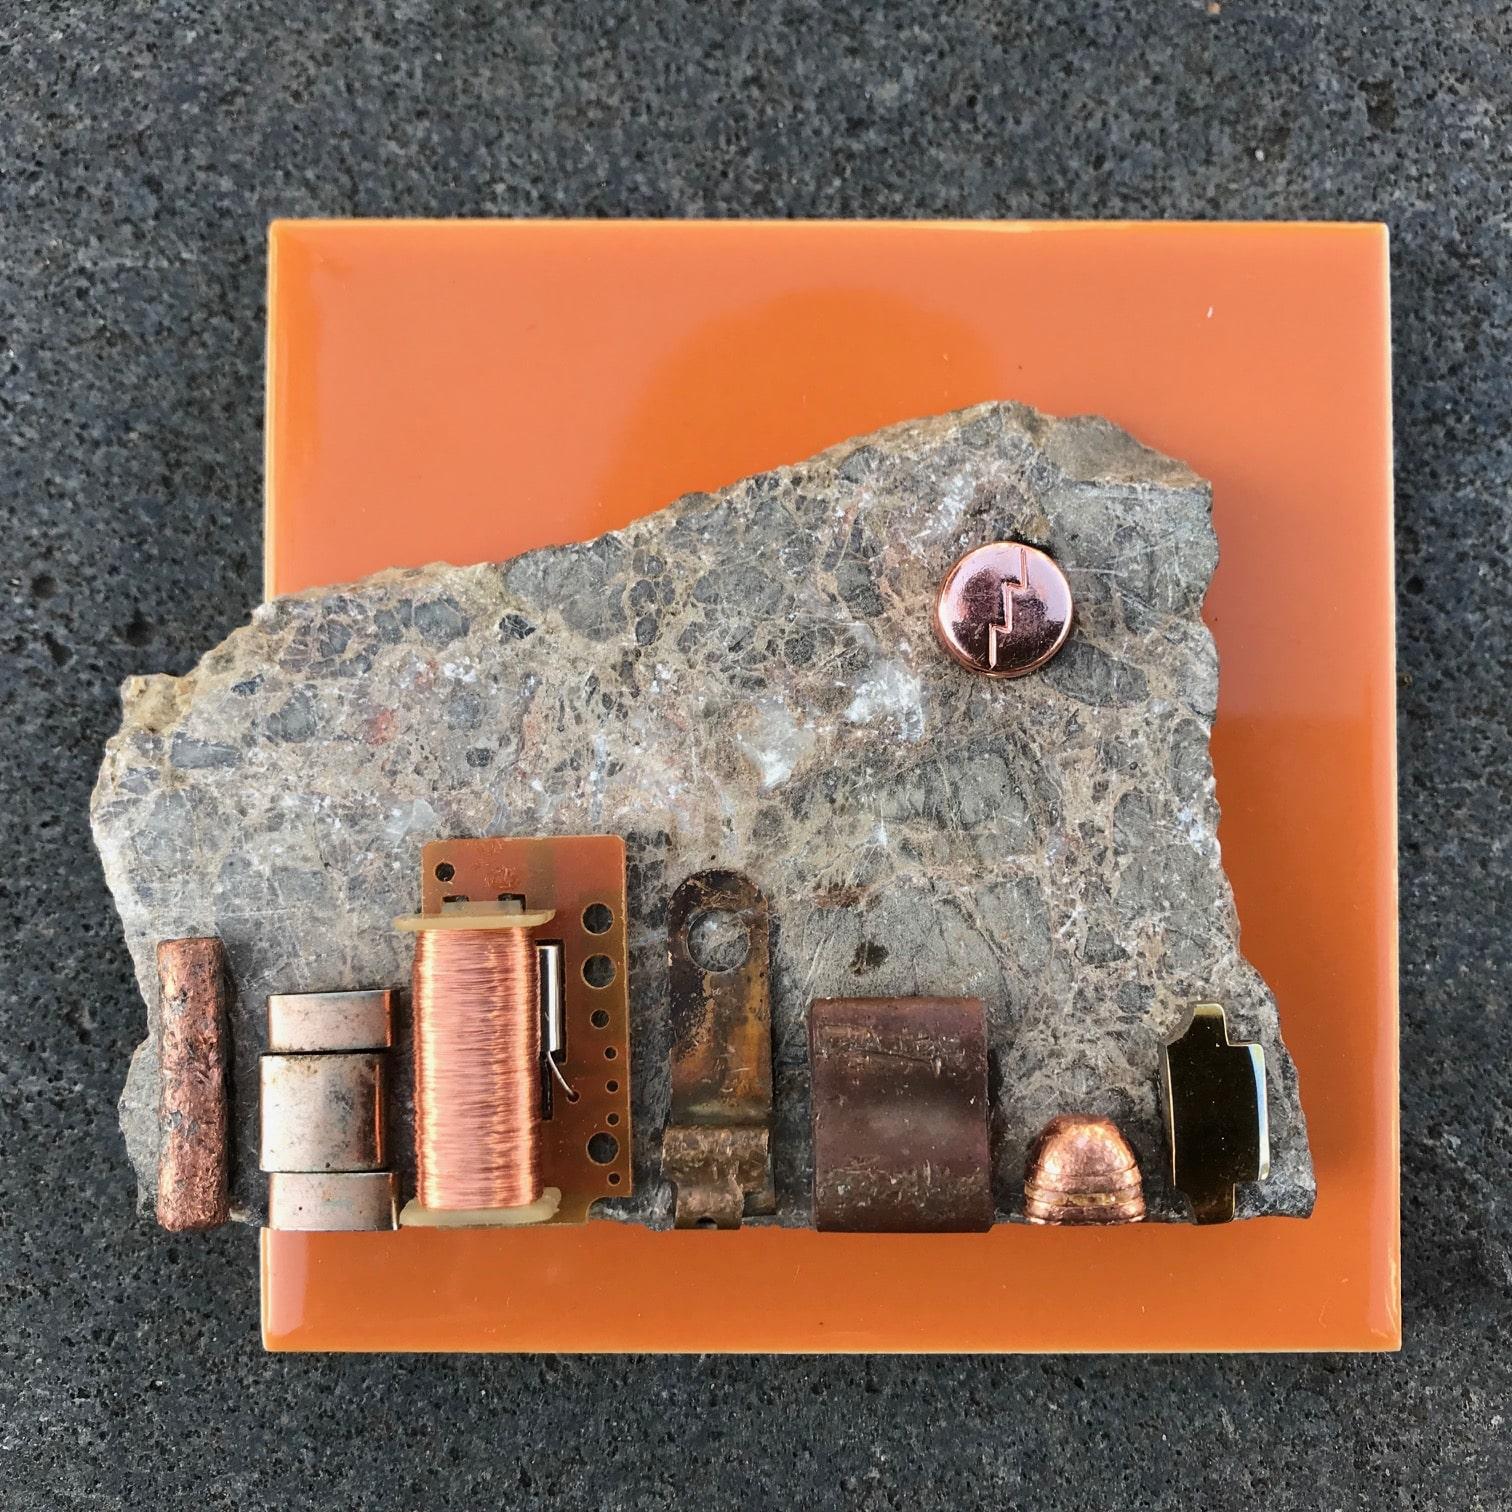 coppertown-60-by-nancy-dee-sculptures-109133-nancylane